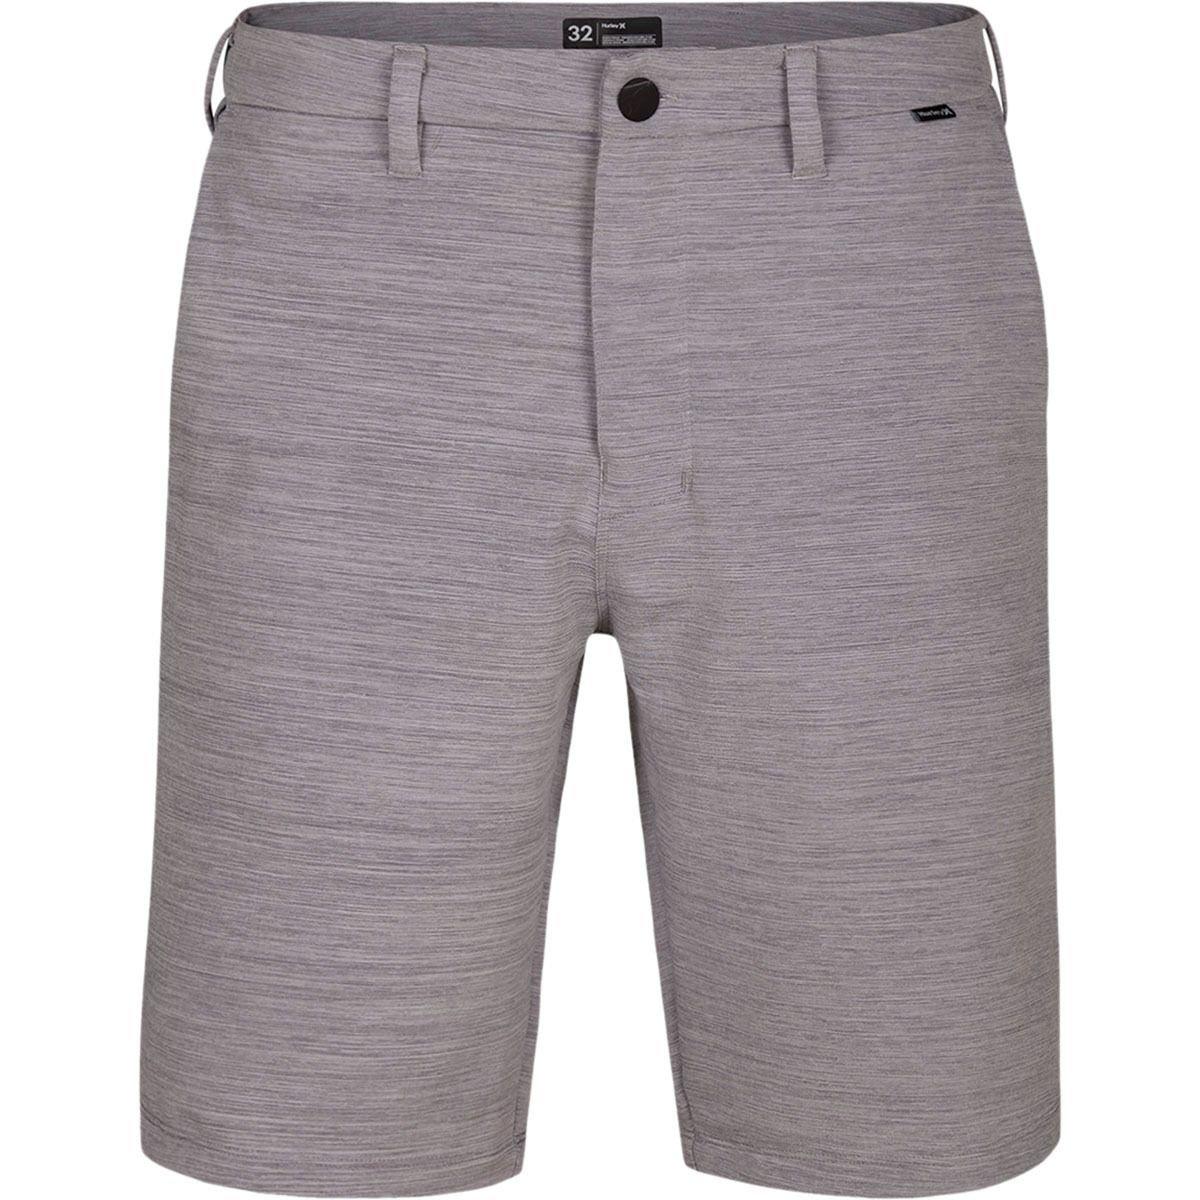 Hurley Dri-FIT Cutback 21'' Chino Shorts - Wolf Grey - 36